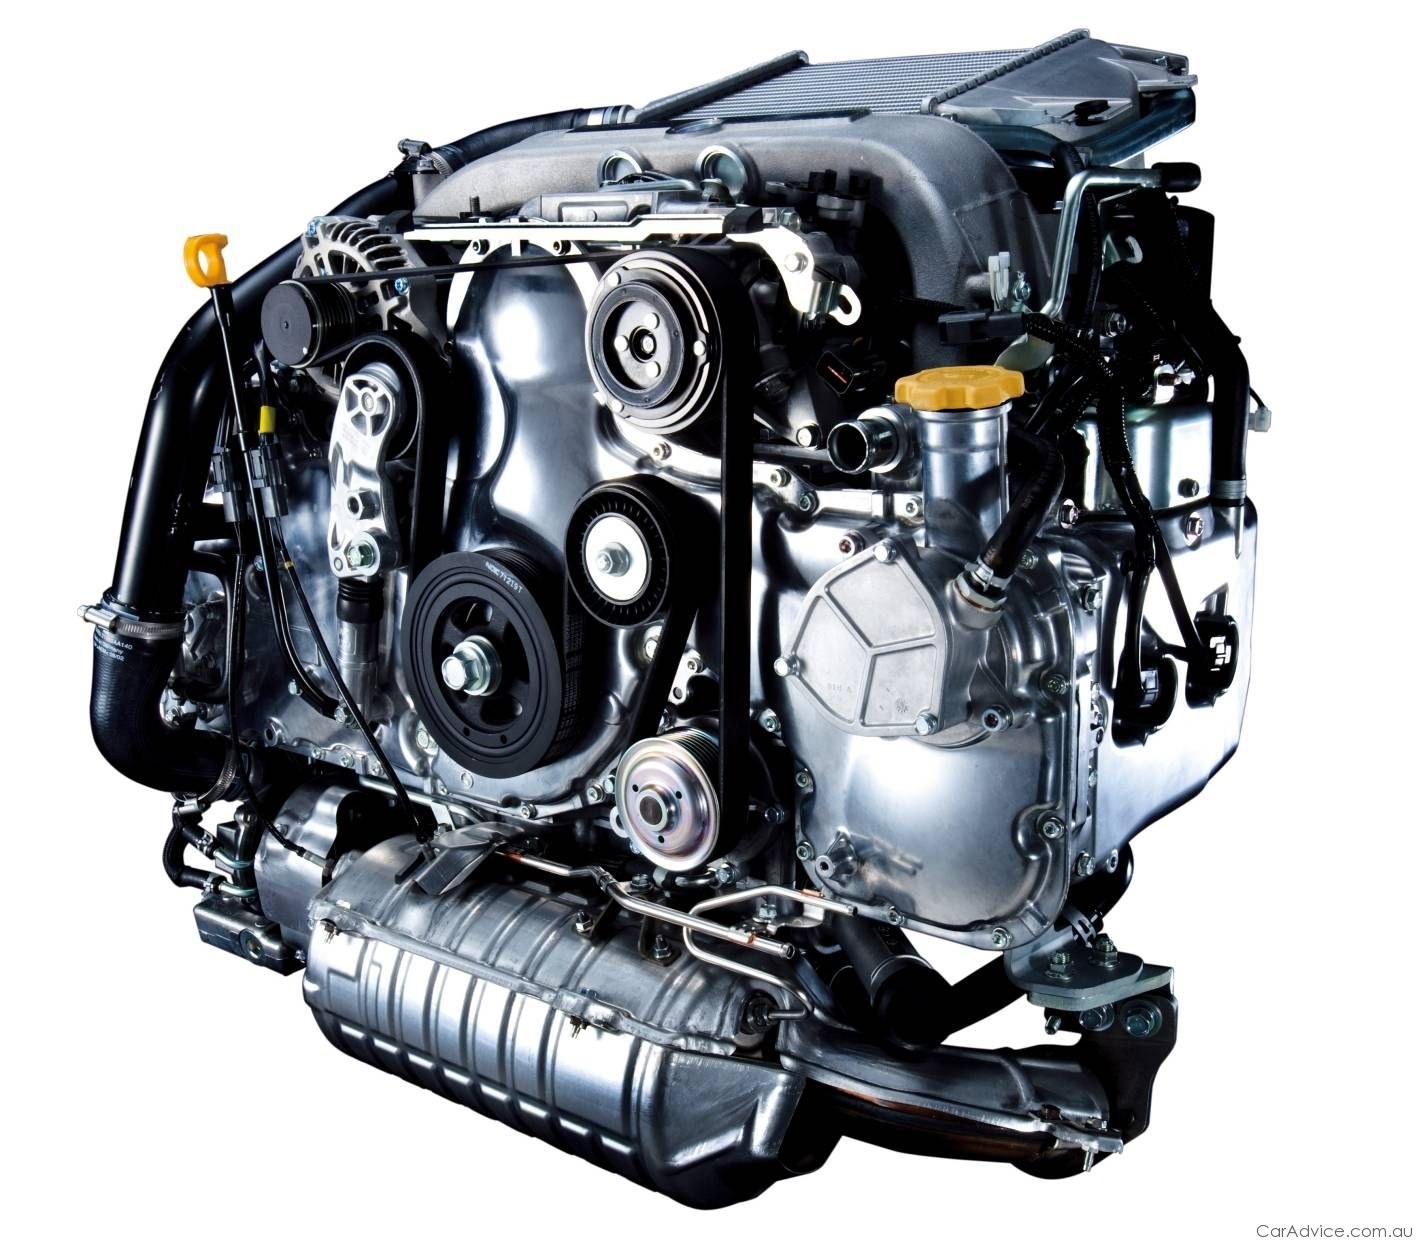 2011 Subaru Forester Gas Engine Gas 2 5l Part Name 2011 Subaru Forester Gas Engine Fits 2 5l Vin D 6th Digit Canada Automobile Used Subaru Diesel